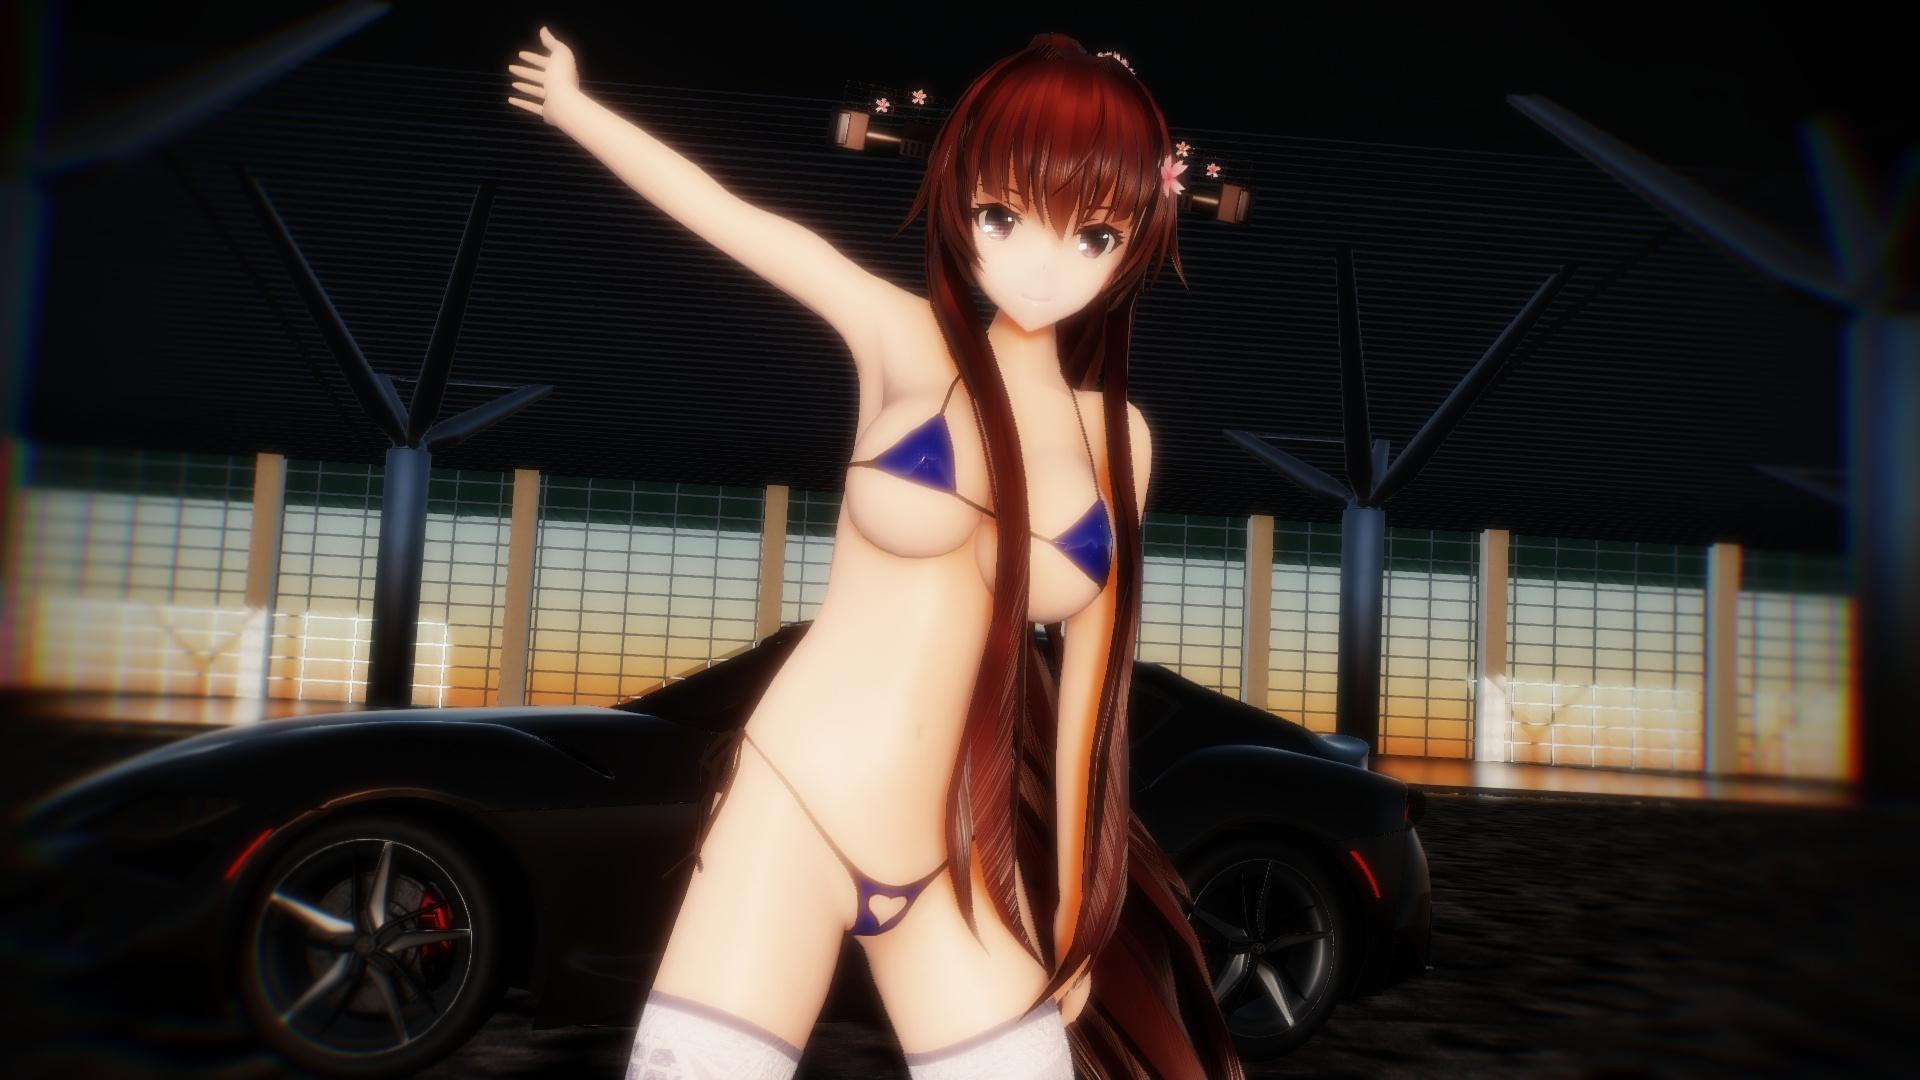 Waifu Sex Simulator Free Anime VR Porn